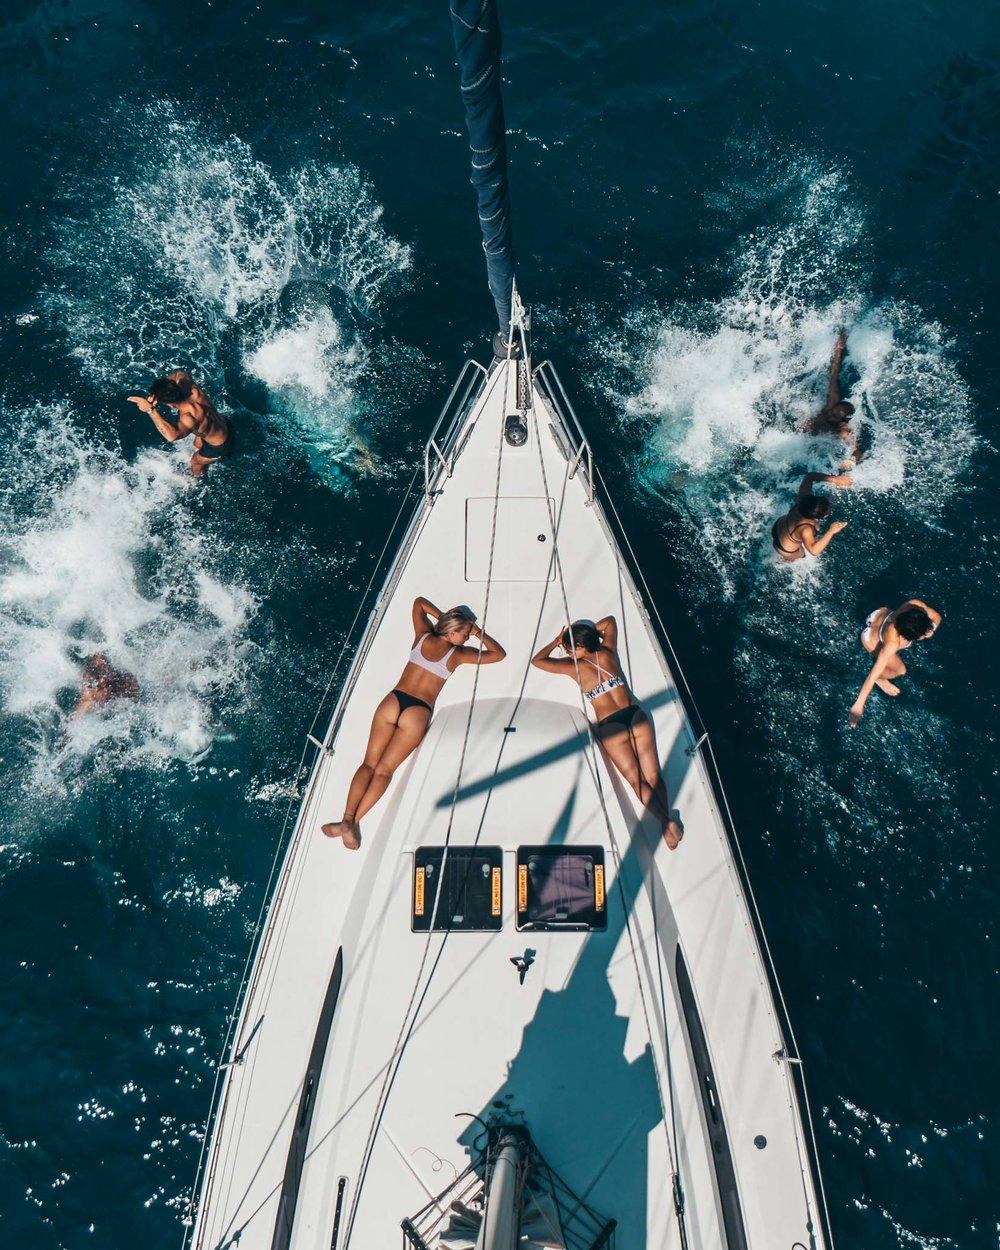 Oliver_Sjostrom_Sized_for_web_Sailing_Greece-1.jpg